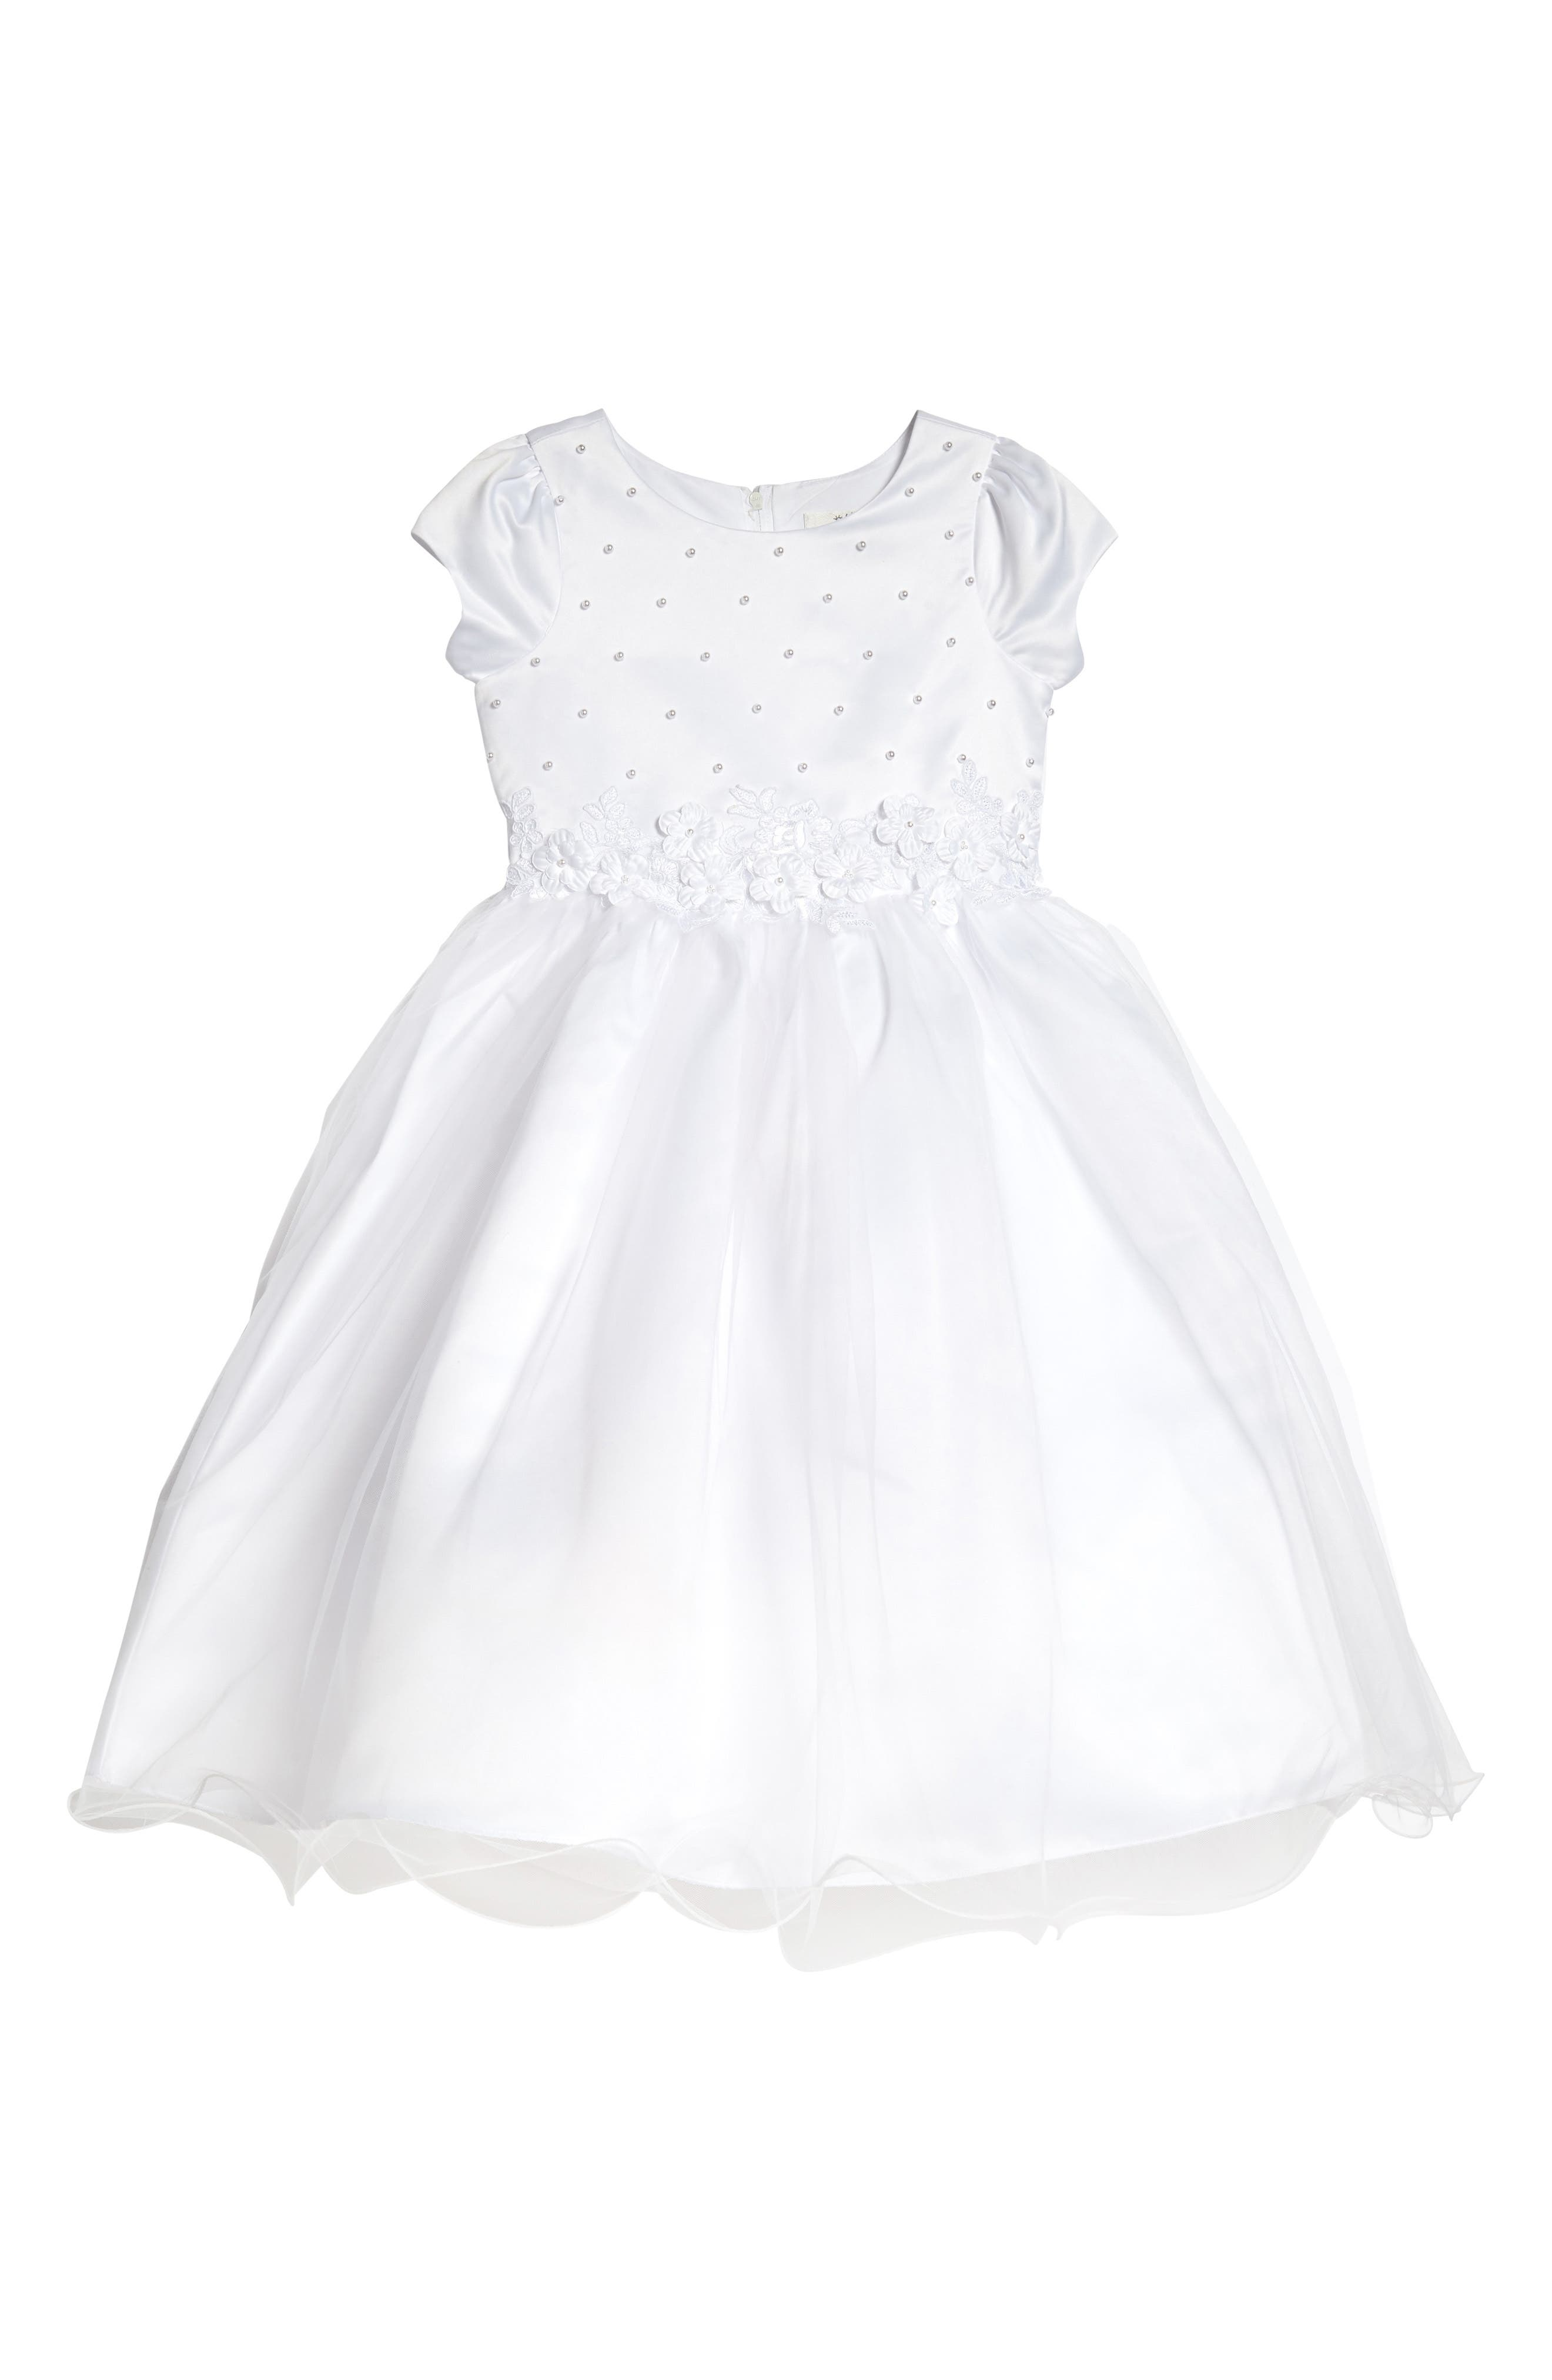 Main Image - Us Angels Embellished Satin & Organza Dress (Little Girls & Big Girls)